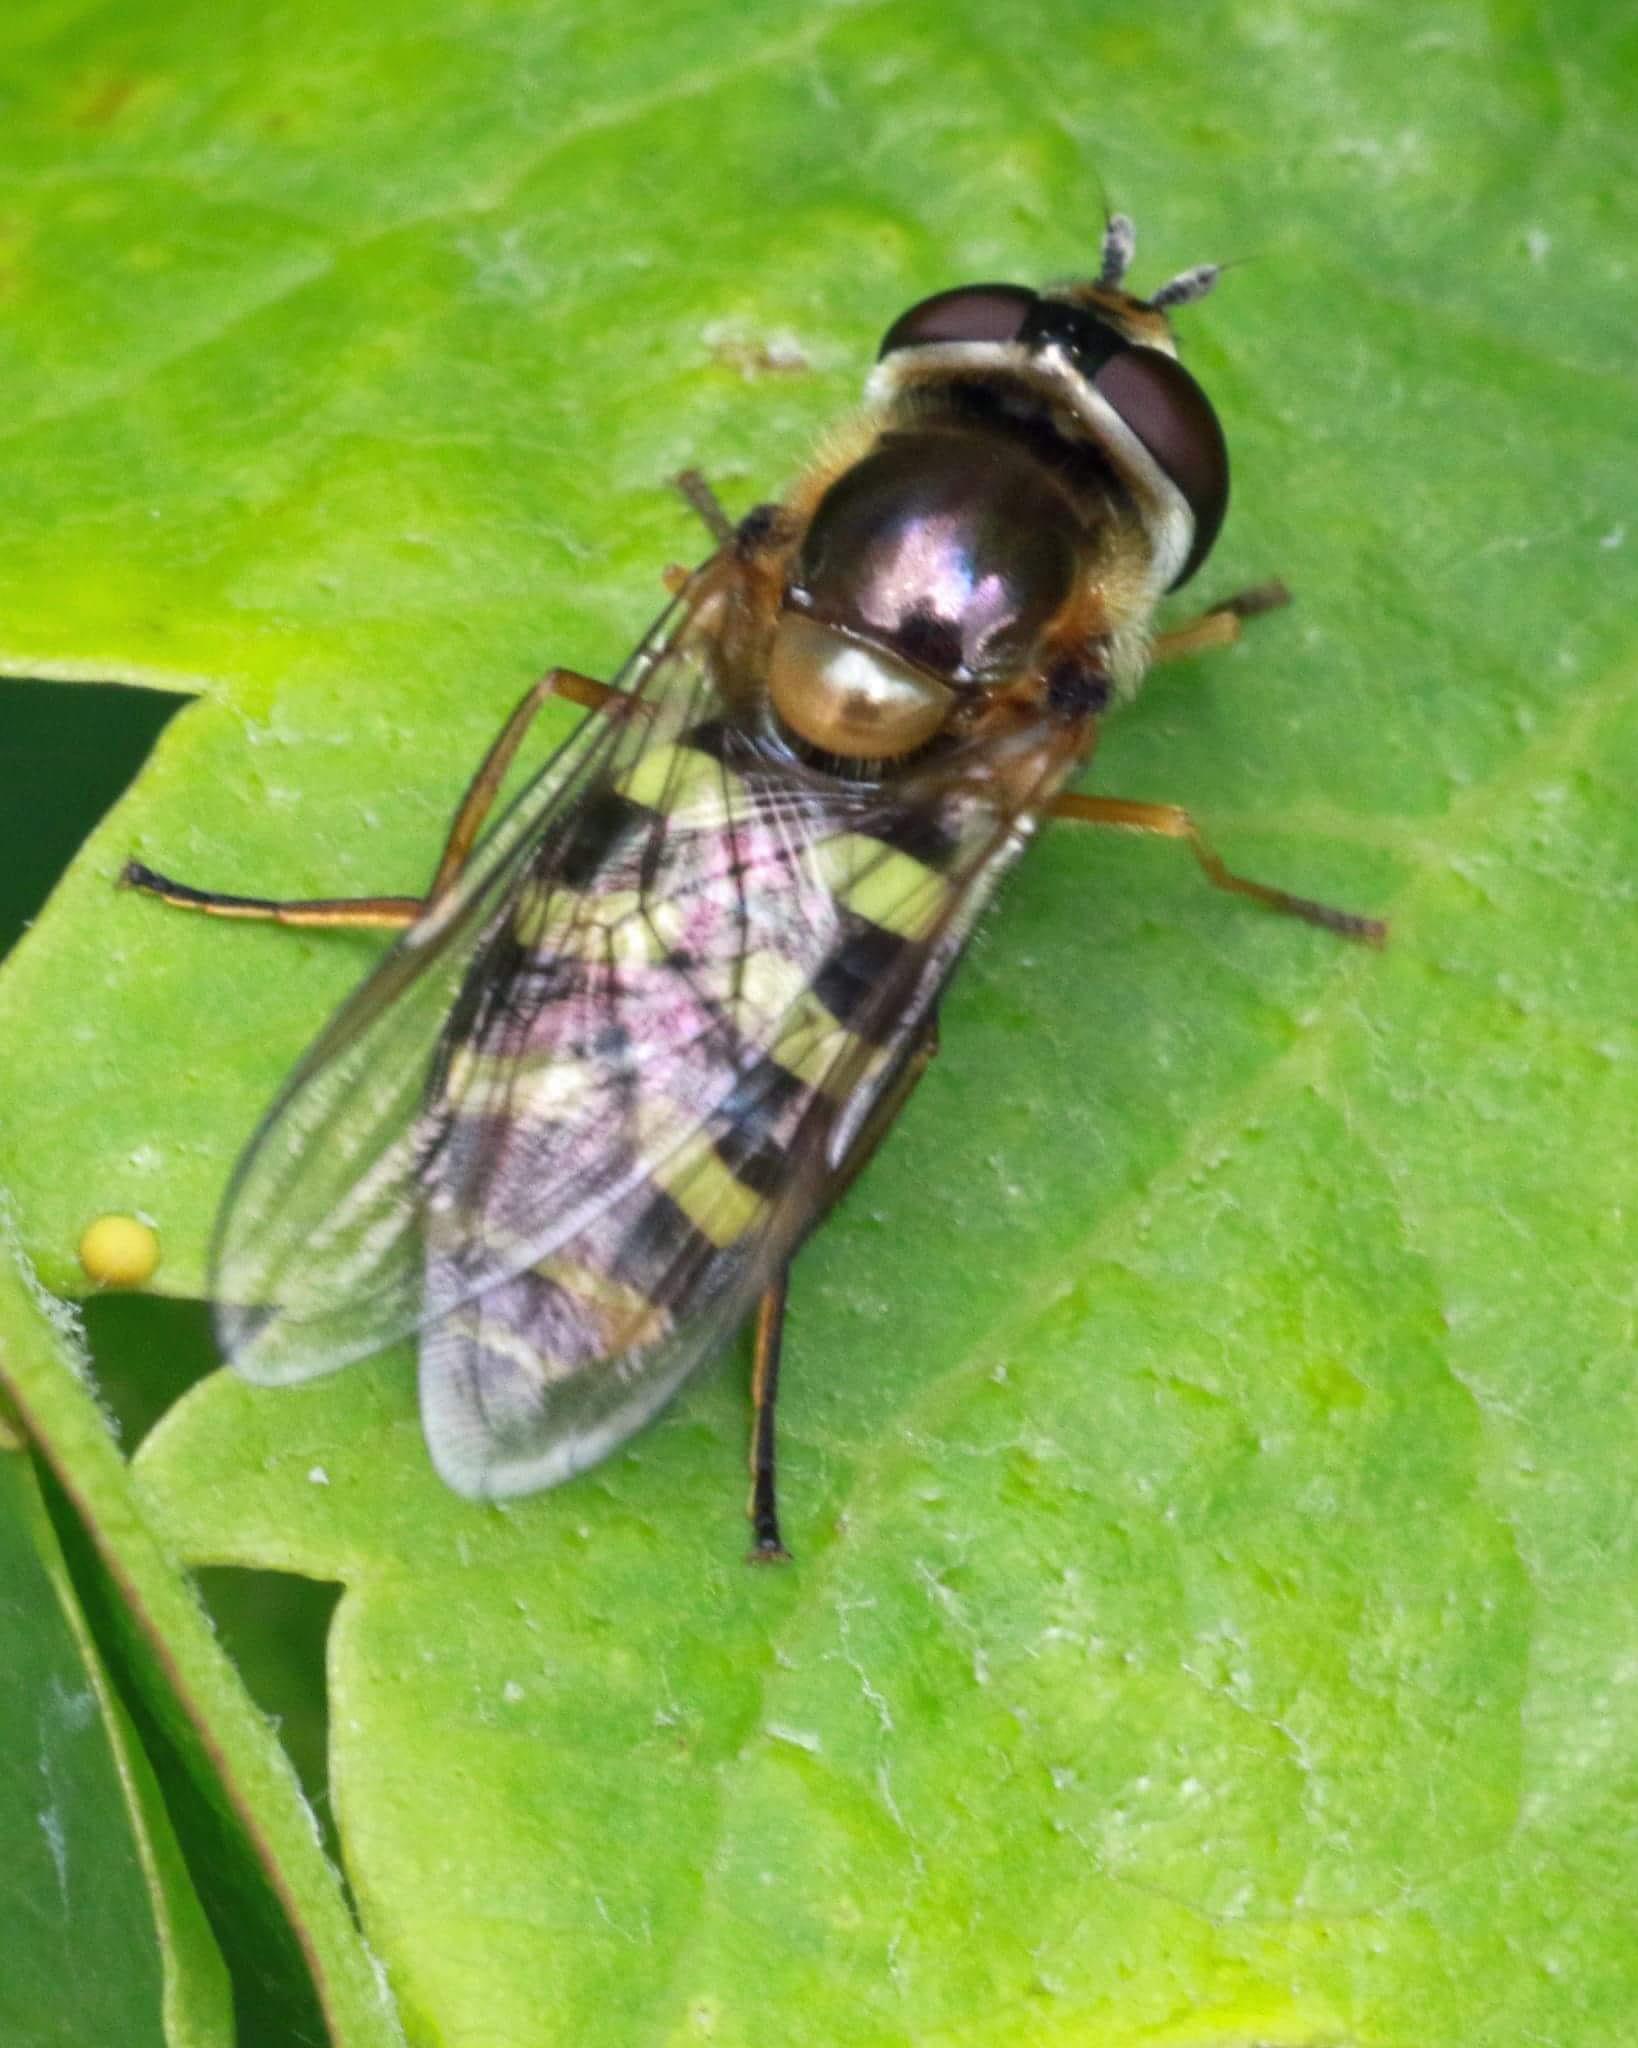 hover fly on grape vine leaf by Nicholas Rawsthorne